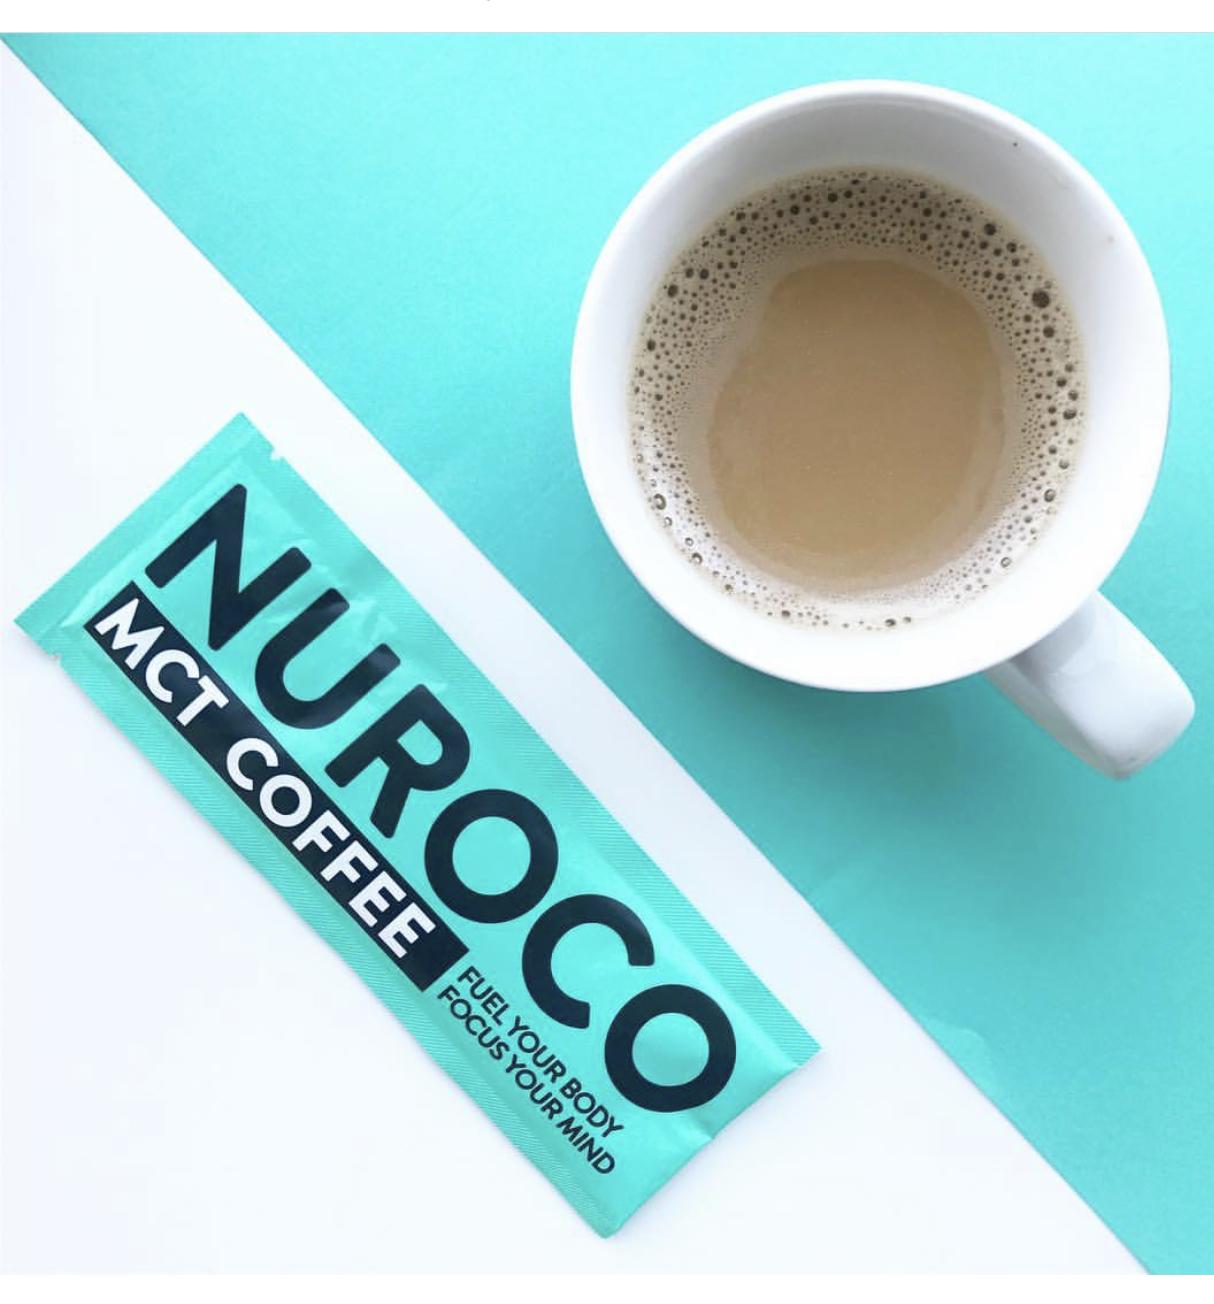 Coffee - NUROCCO